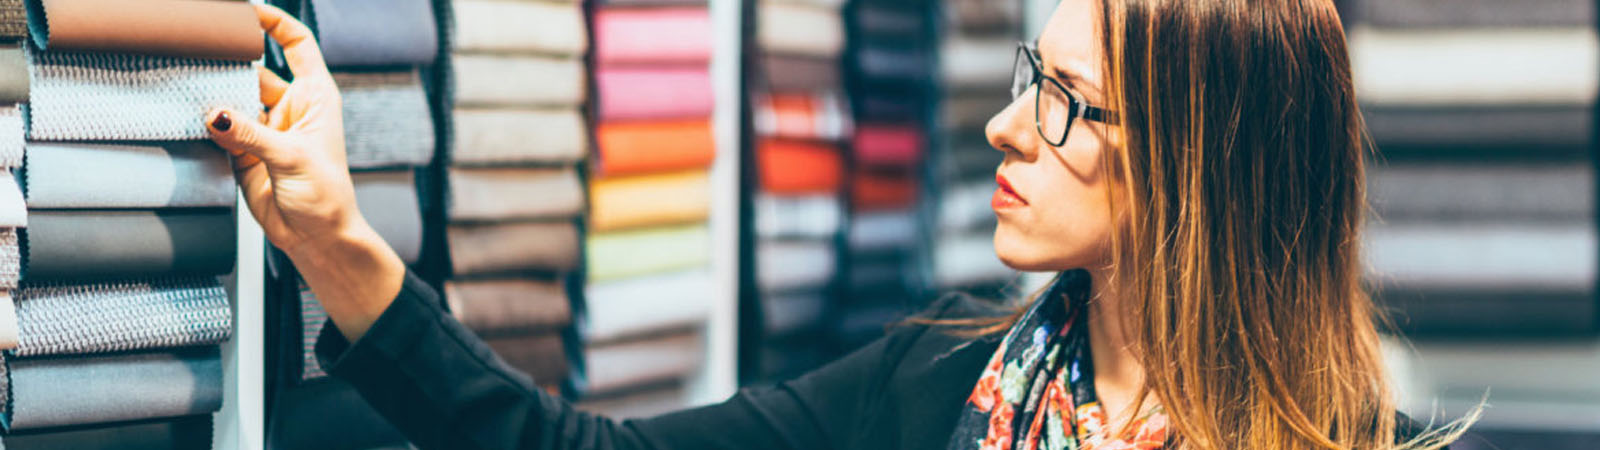 feira da indústria textil